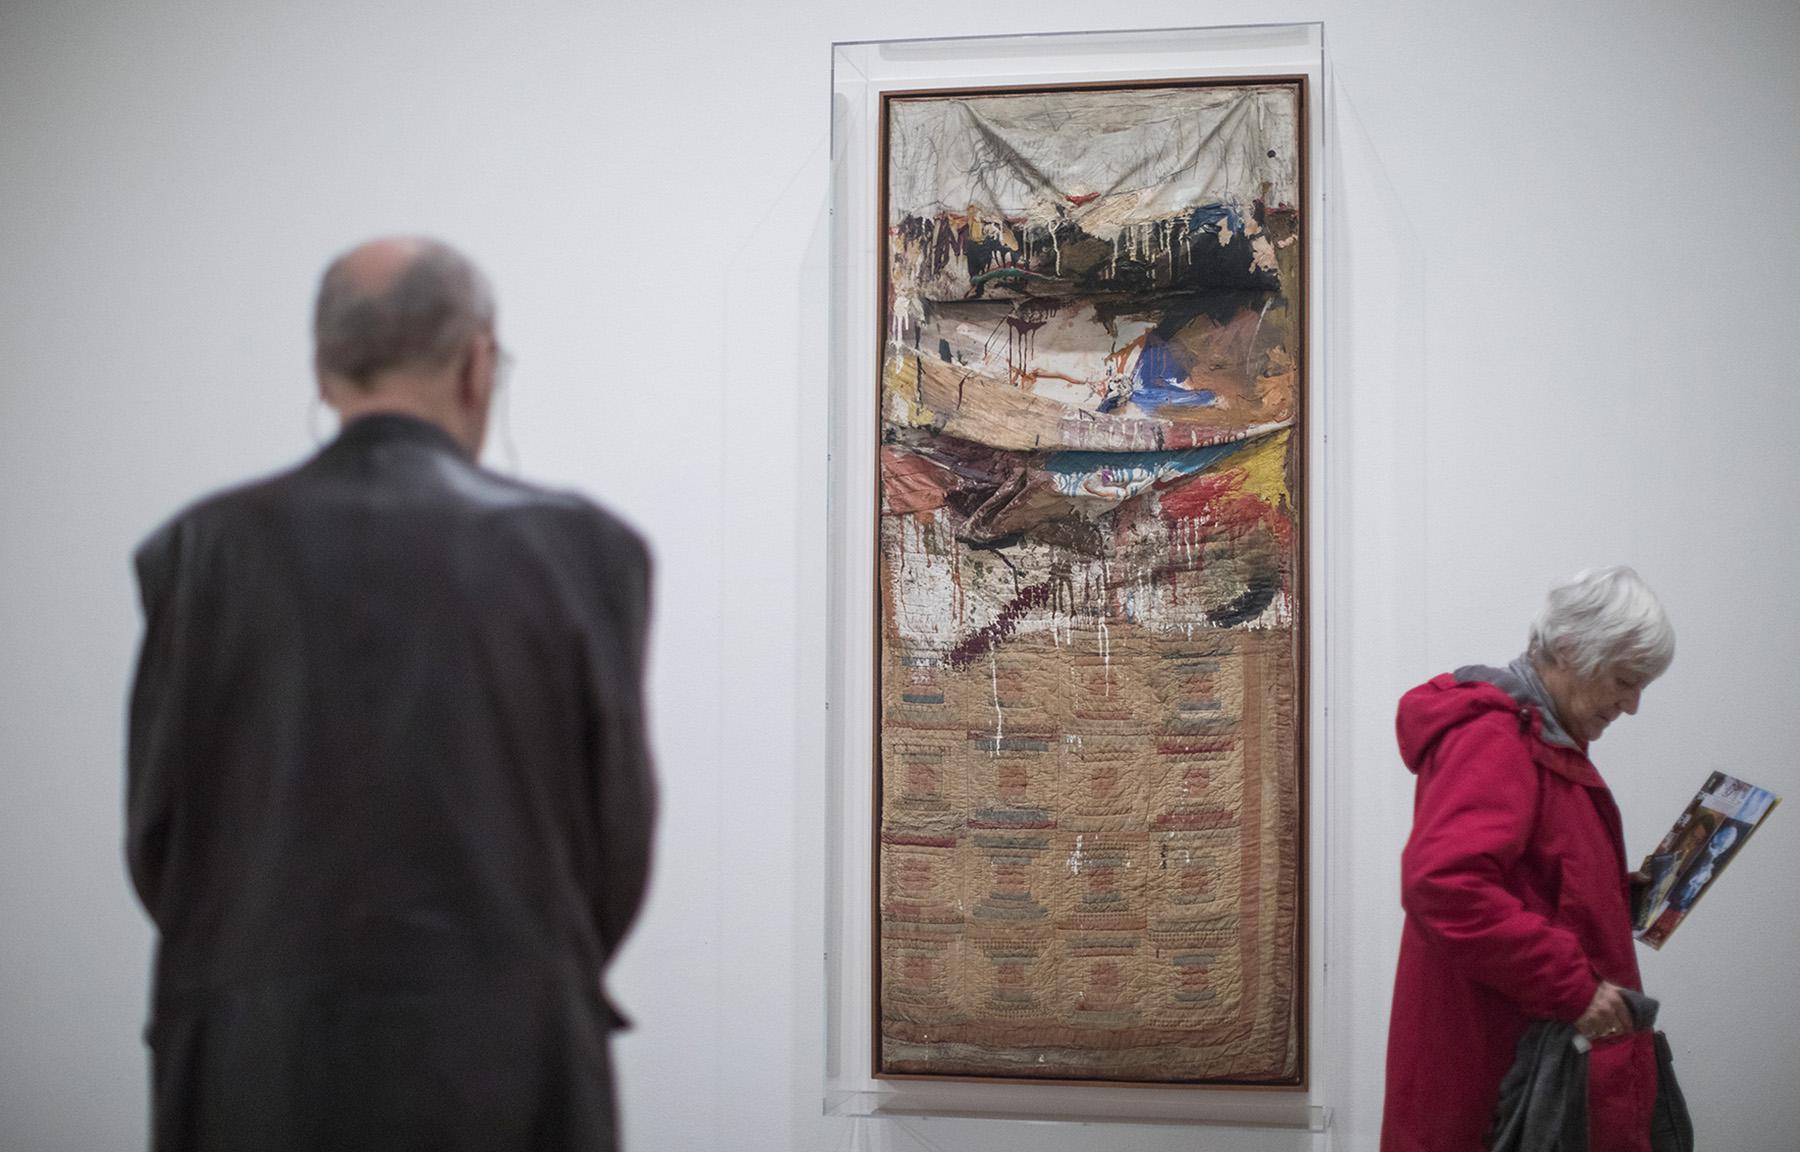 Robert Rauschenberg exhibit opens